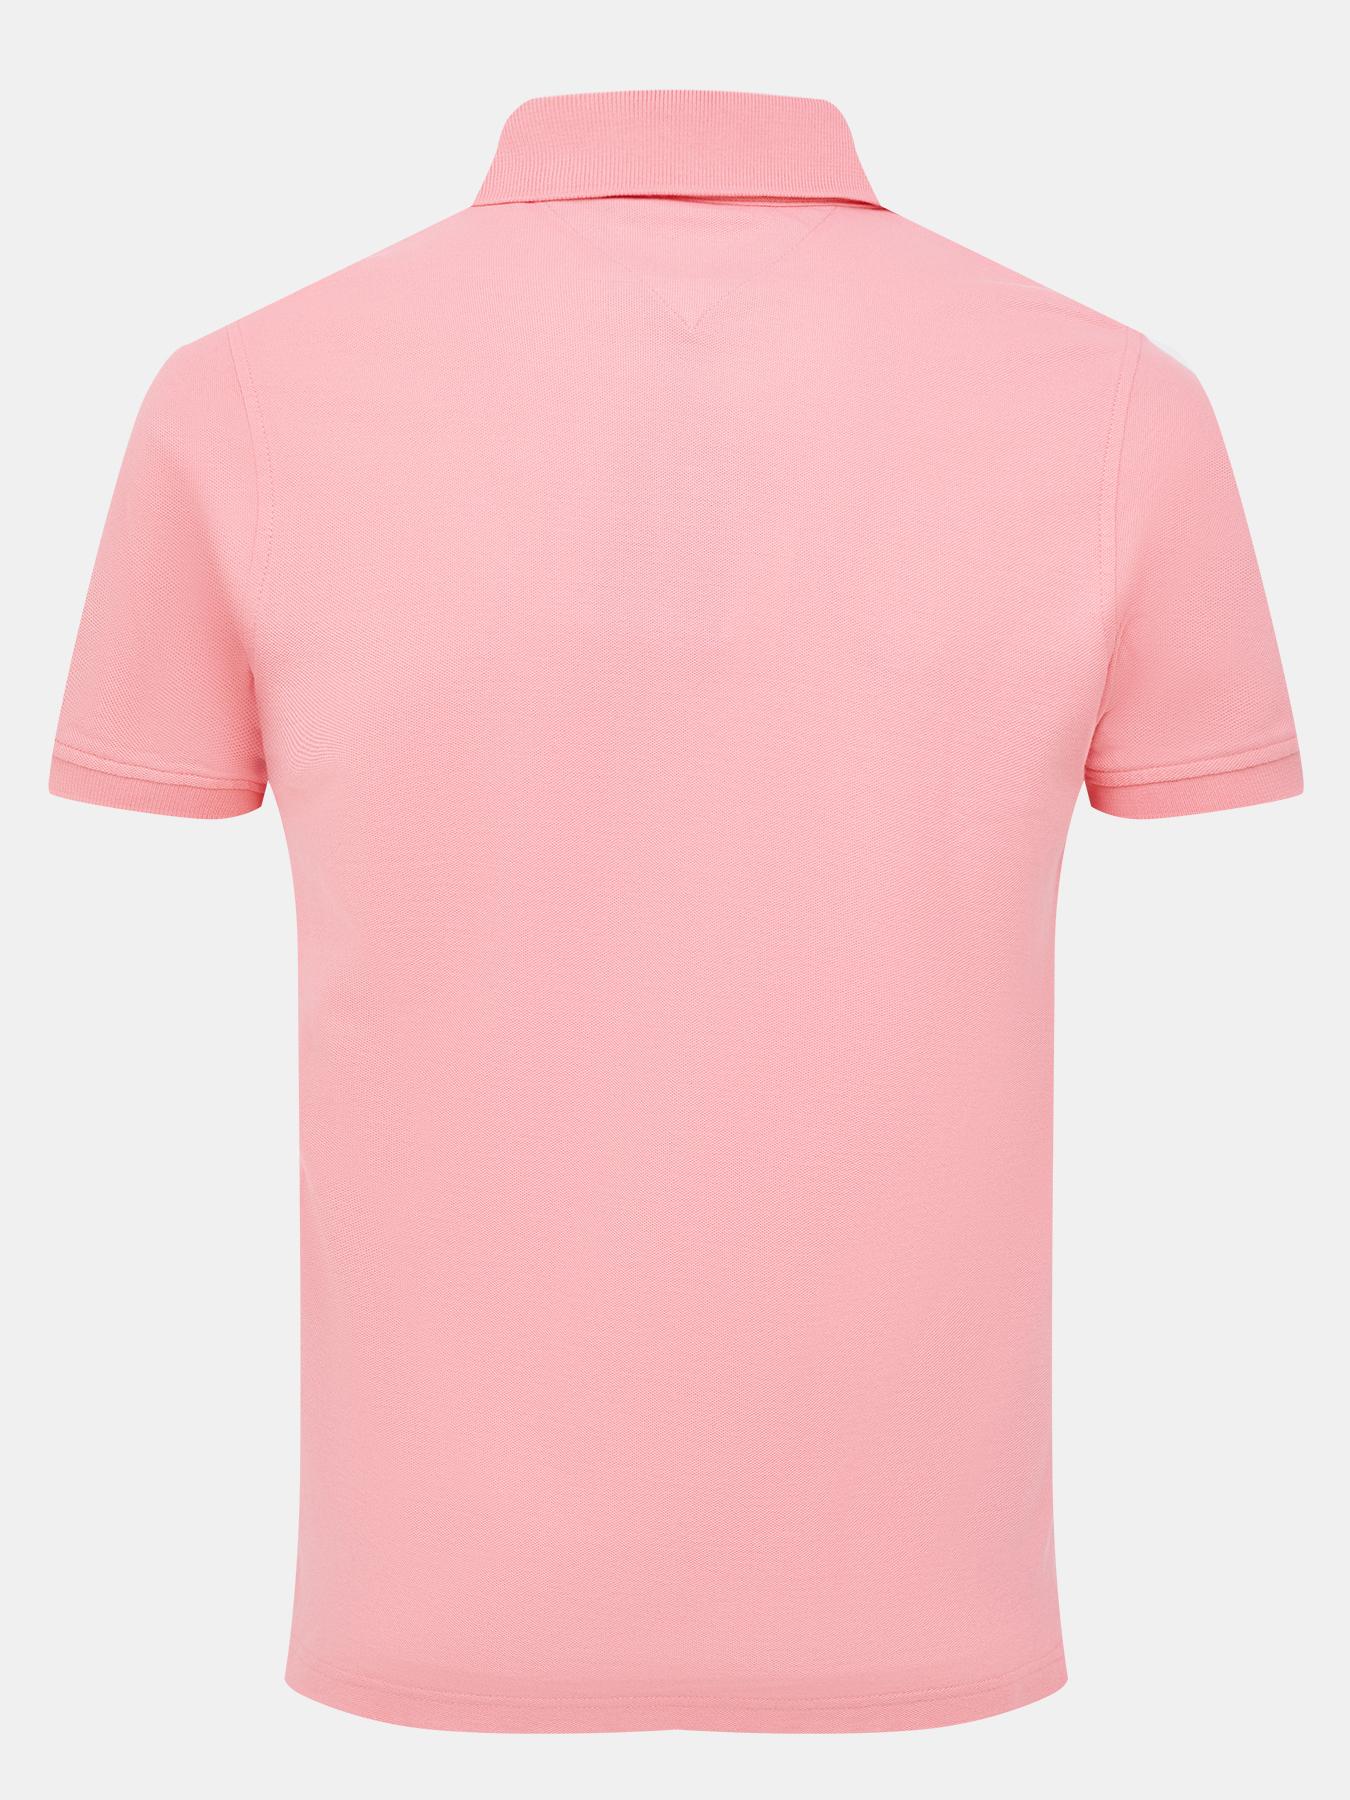 Рубашка поло Tommy Hilfiger Поло портмоне tommy hilfiger am0am00659 002 black